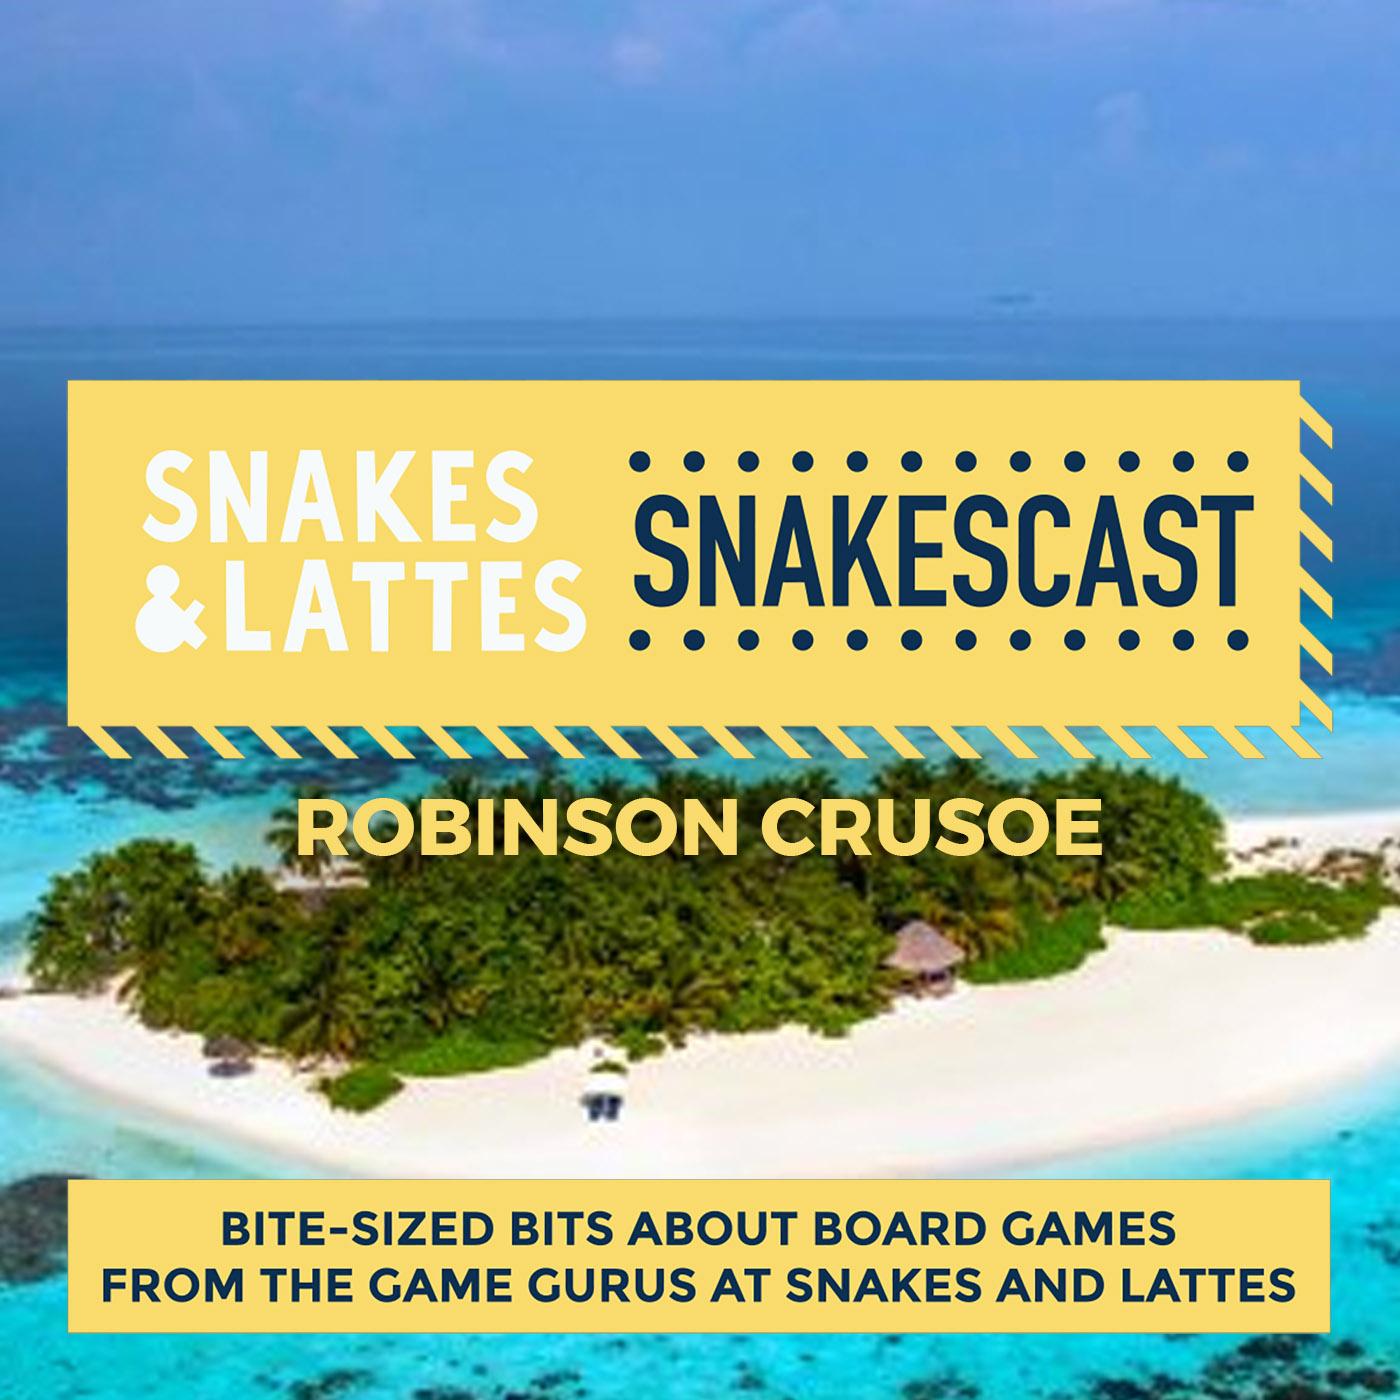 Robinson Crusoe, Part 2 - Surviving the Island